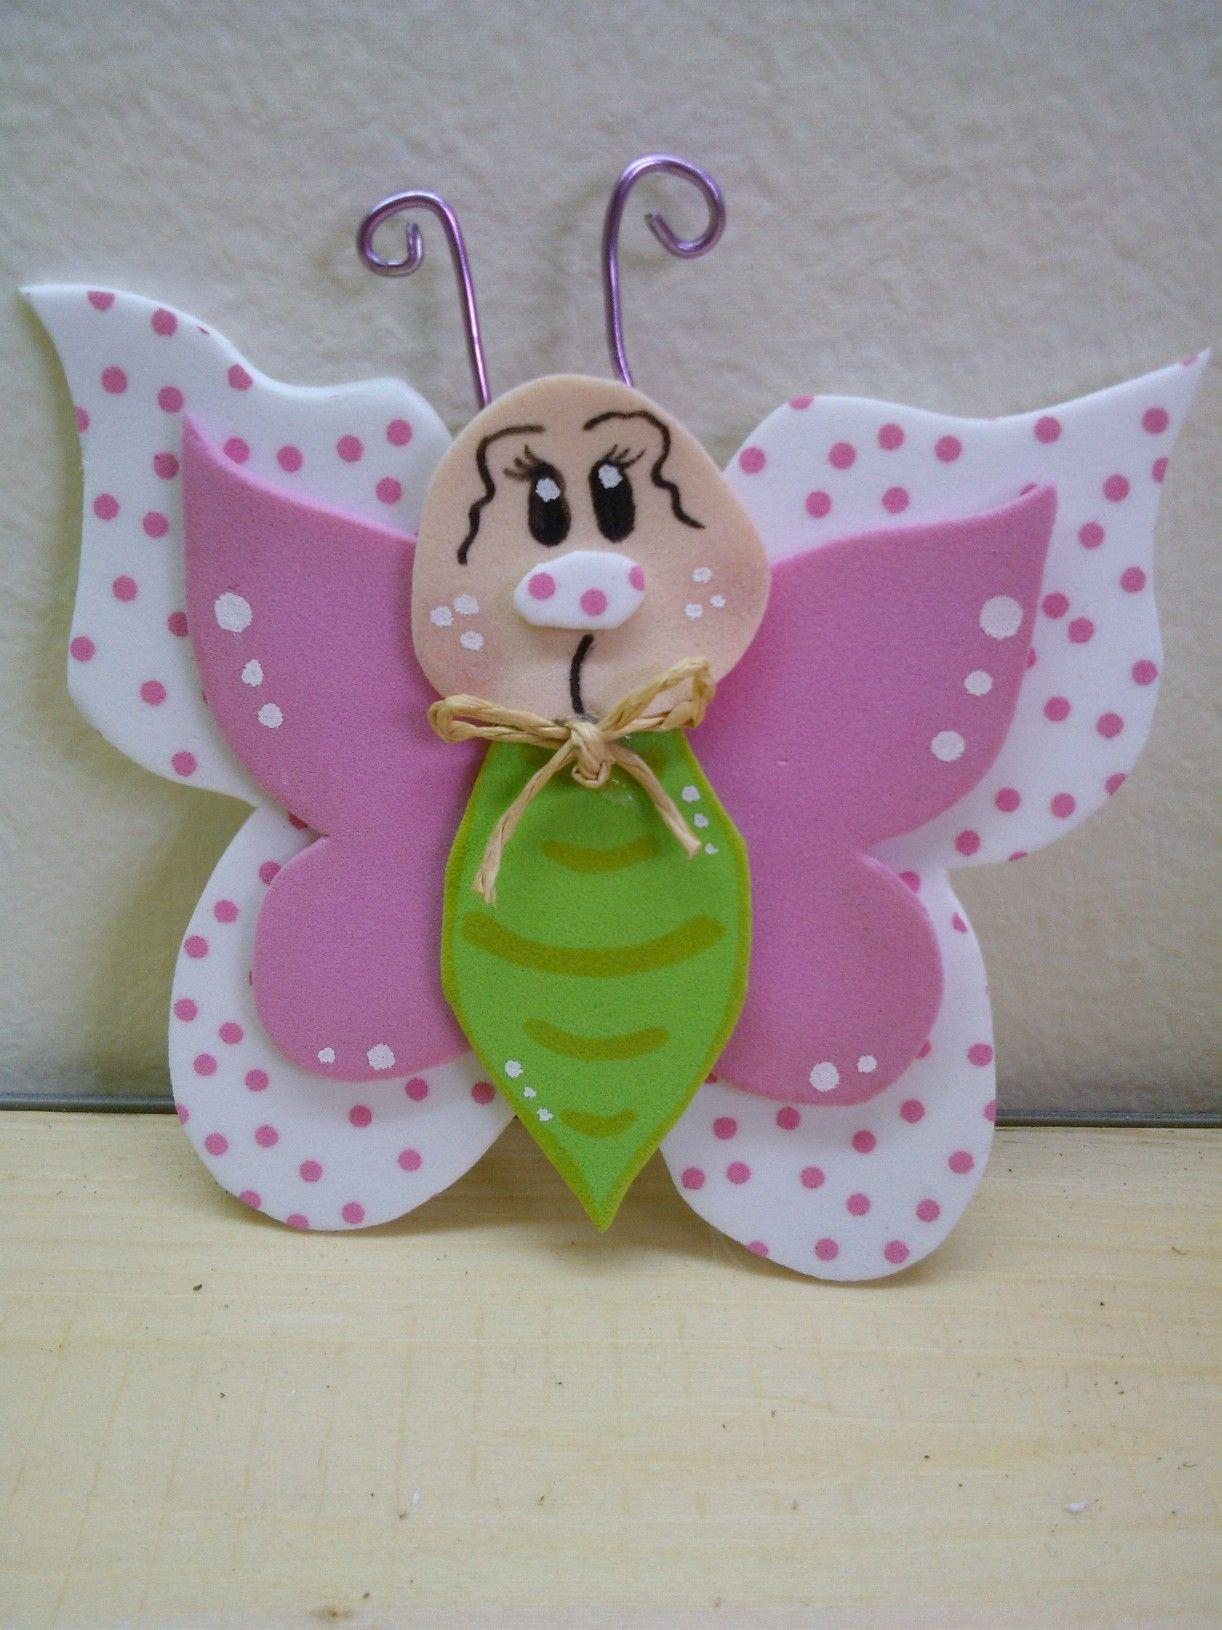 Mariposa en goma eva goma eva pinterest descubre m s - Mariposas goma eva ...